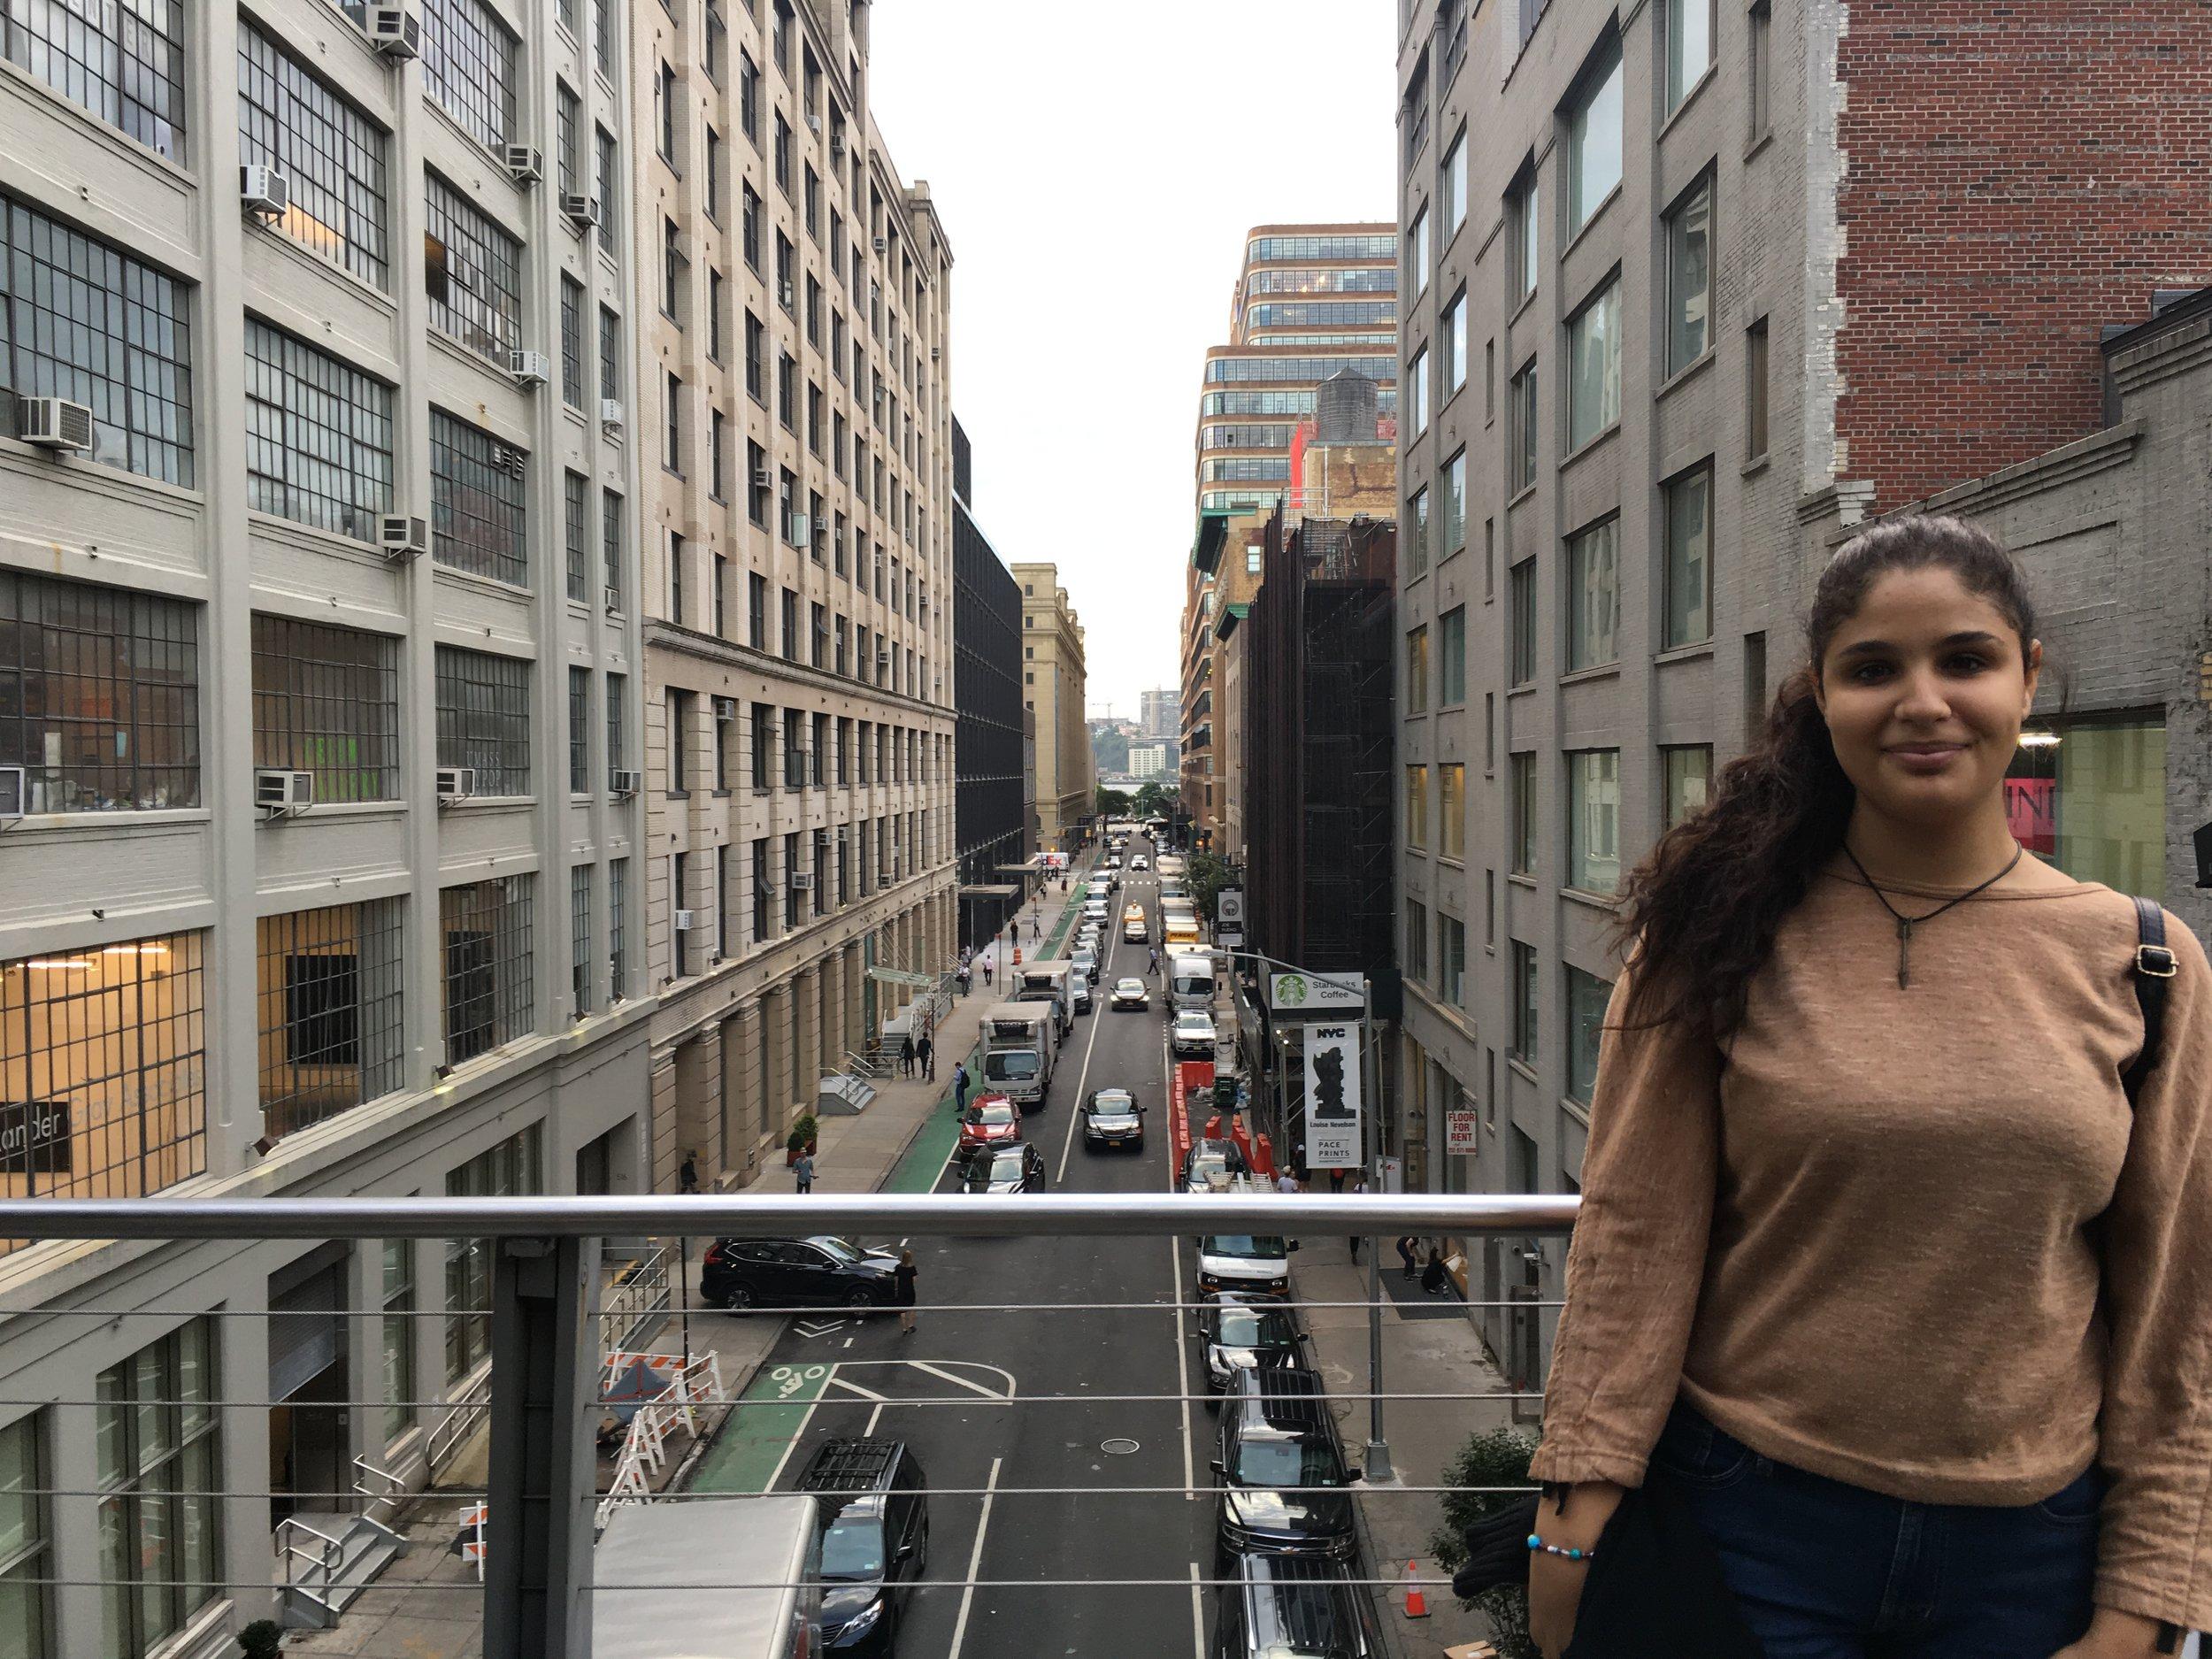 Aseel exploring New York City during the U.N. General Assembly. (Courtesy of Ozlem Eskiocak / UNRWA)